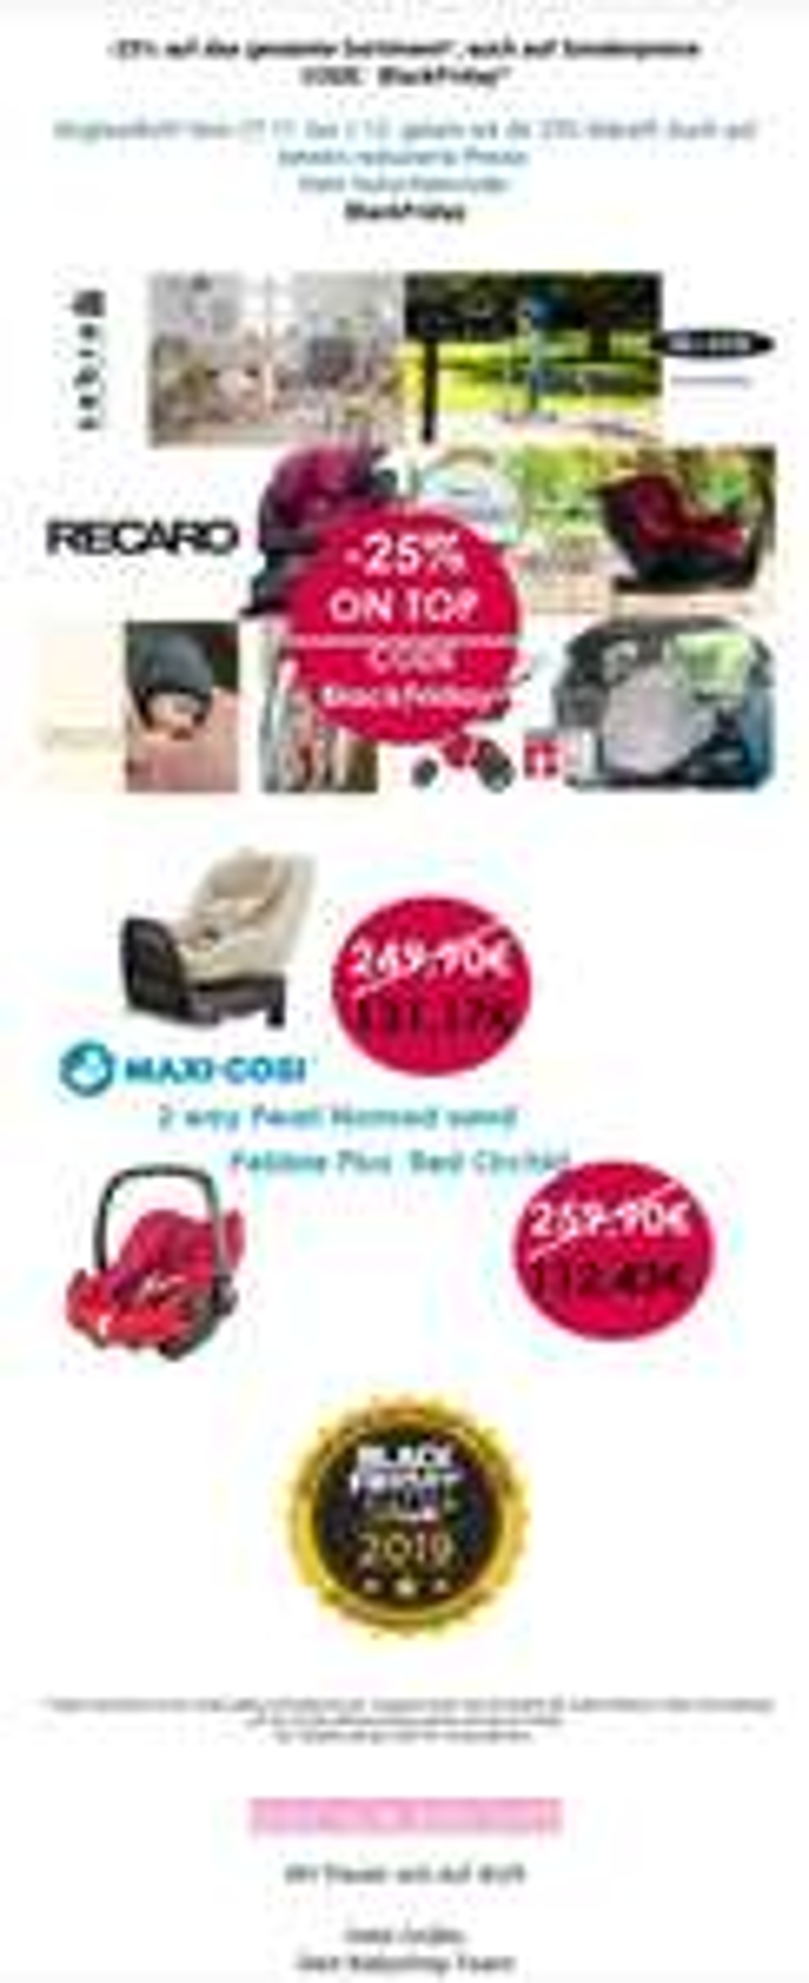 25% bei Babyshop Hunstig z.B. Maxi Cosi 2way Pearl für 131,17 EUR